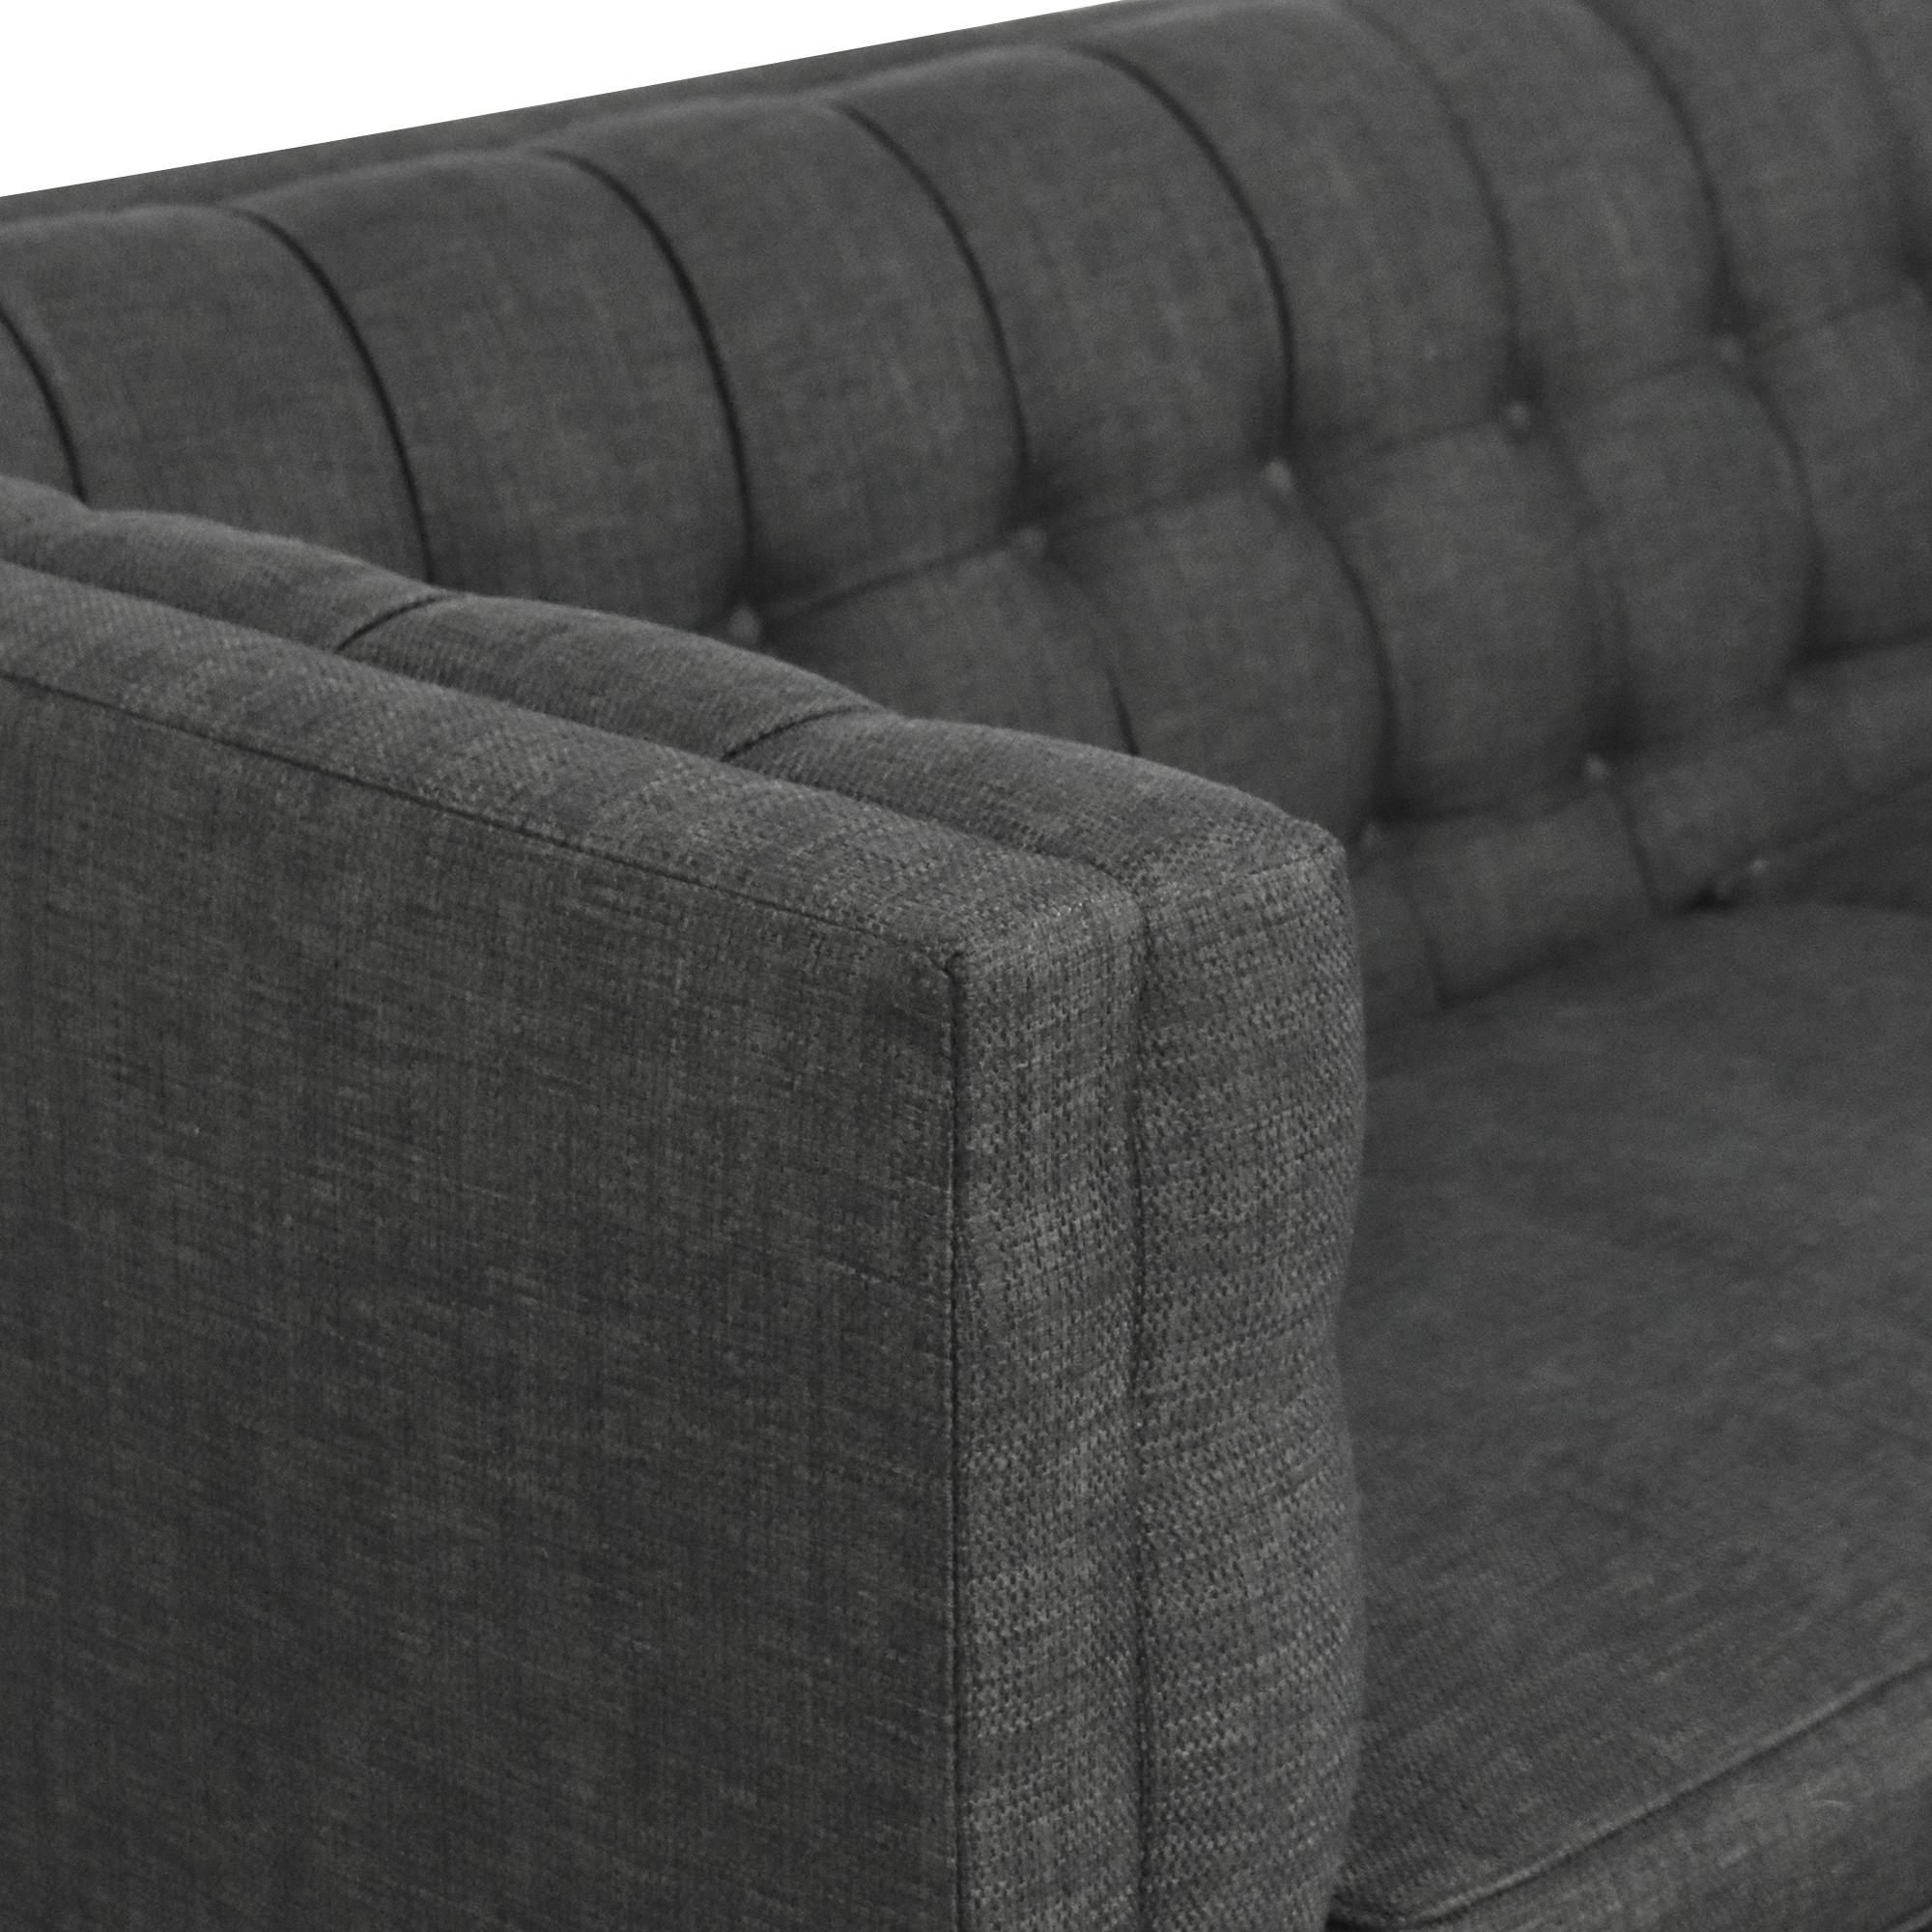 Raymour & Flanigan Raymour & Flanigan Tufted Two Cushion Sofa ma